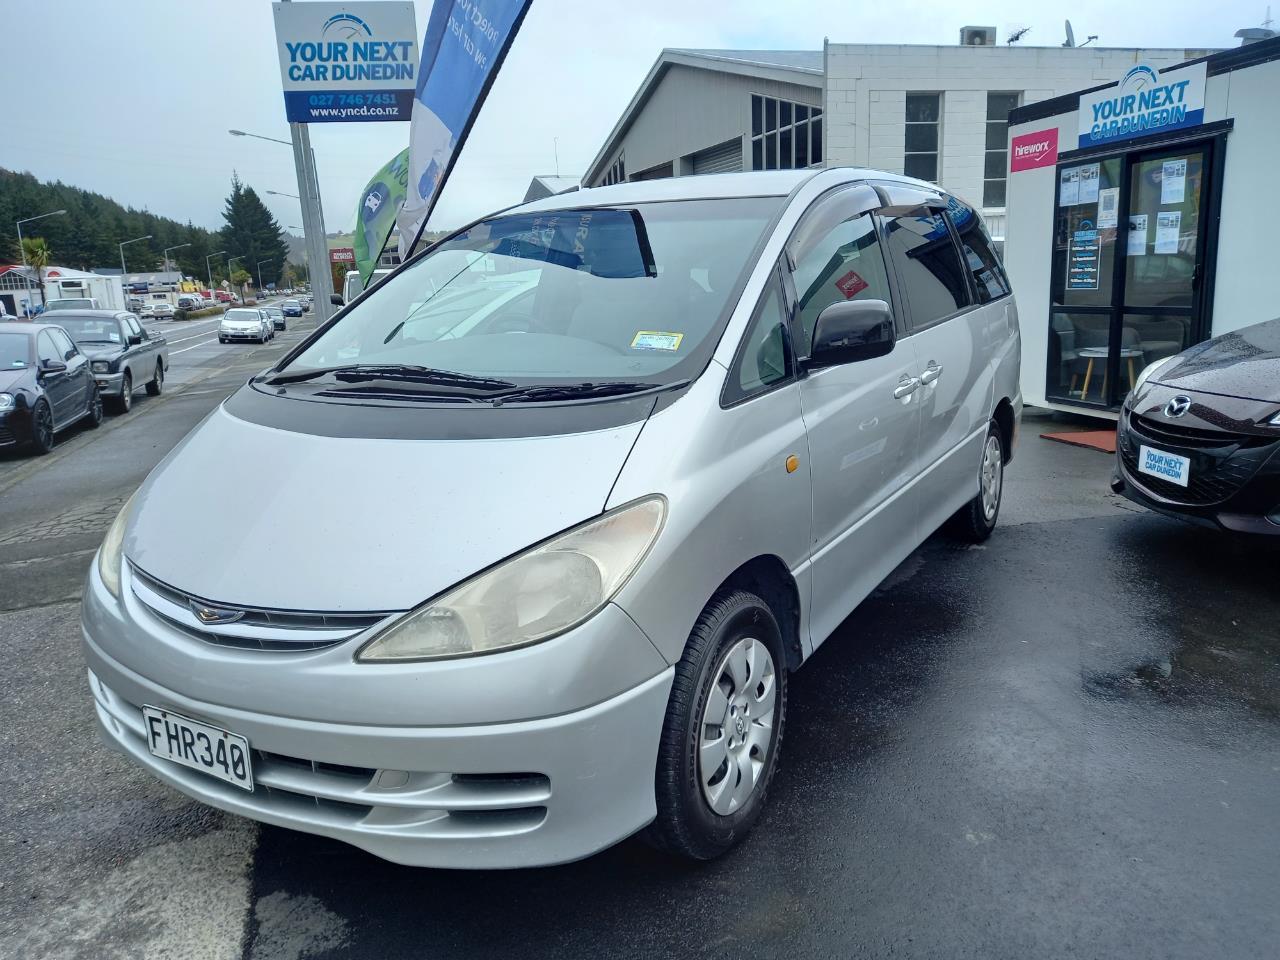 image-5, 2001 Toyota Estima 8 Seats No Deposit Finance at Dunedin